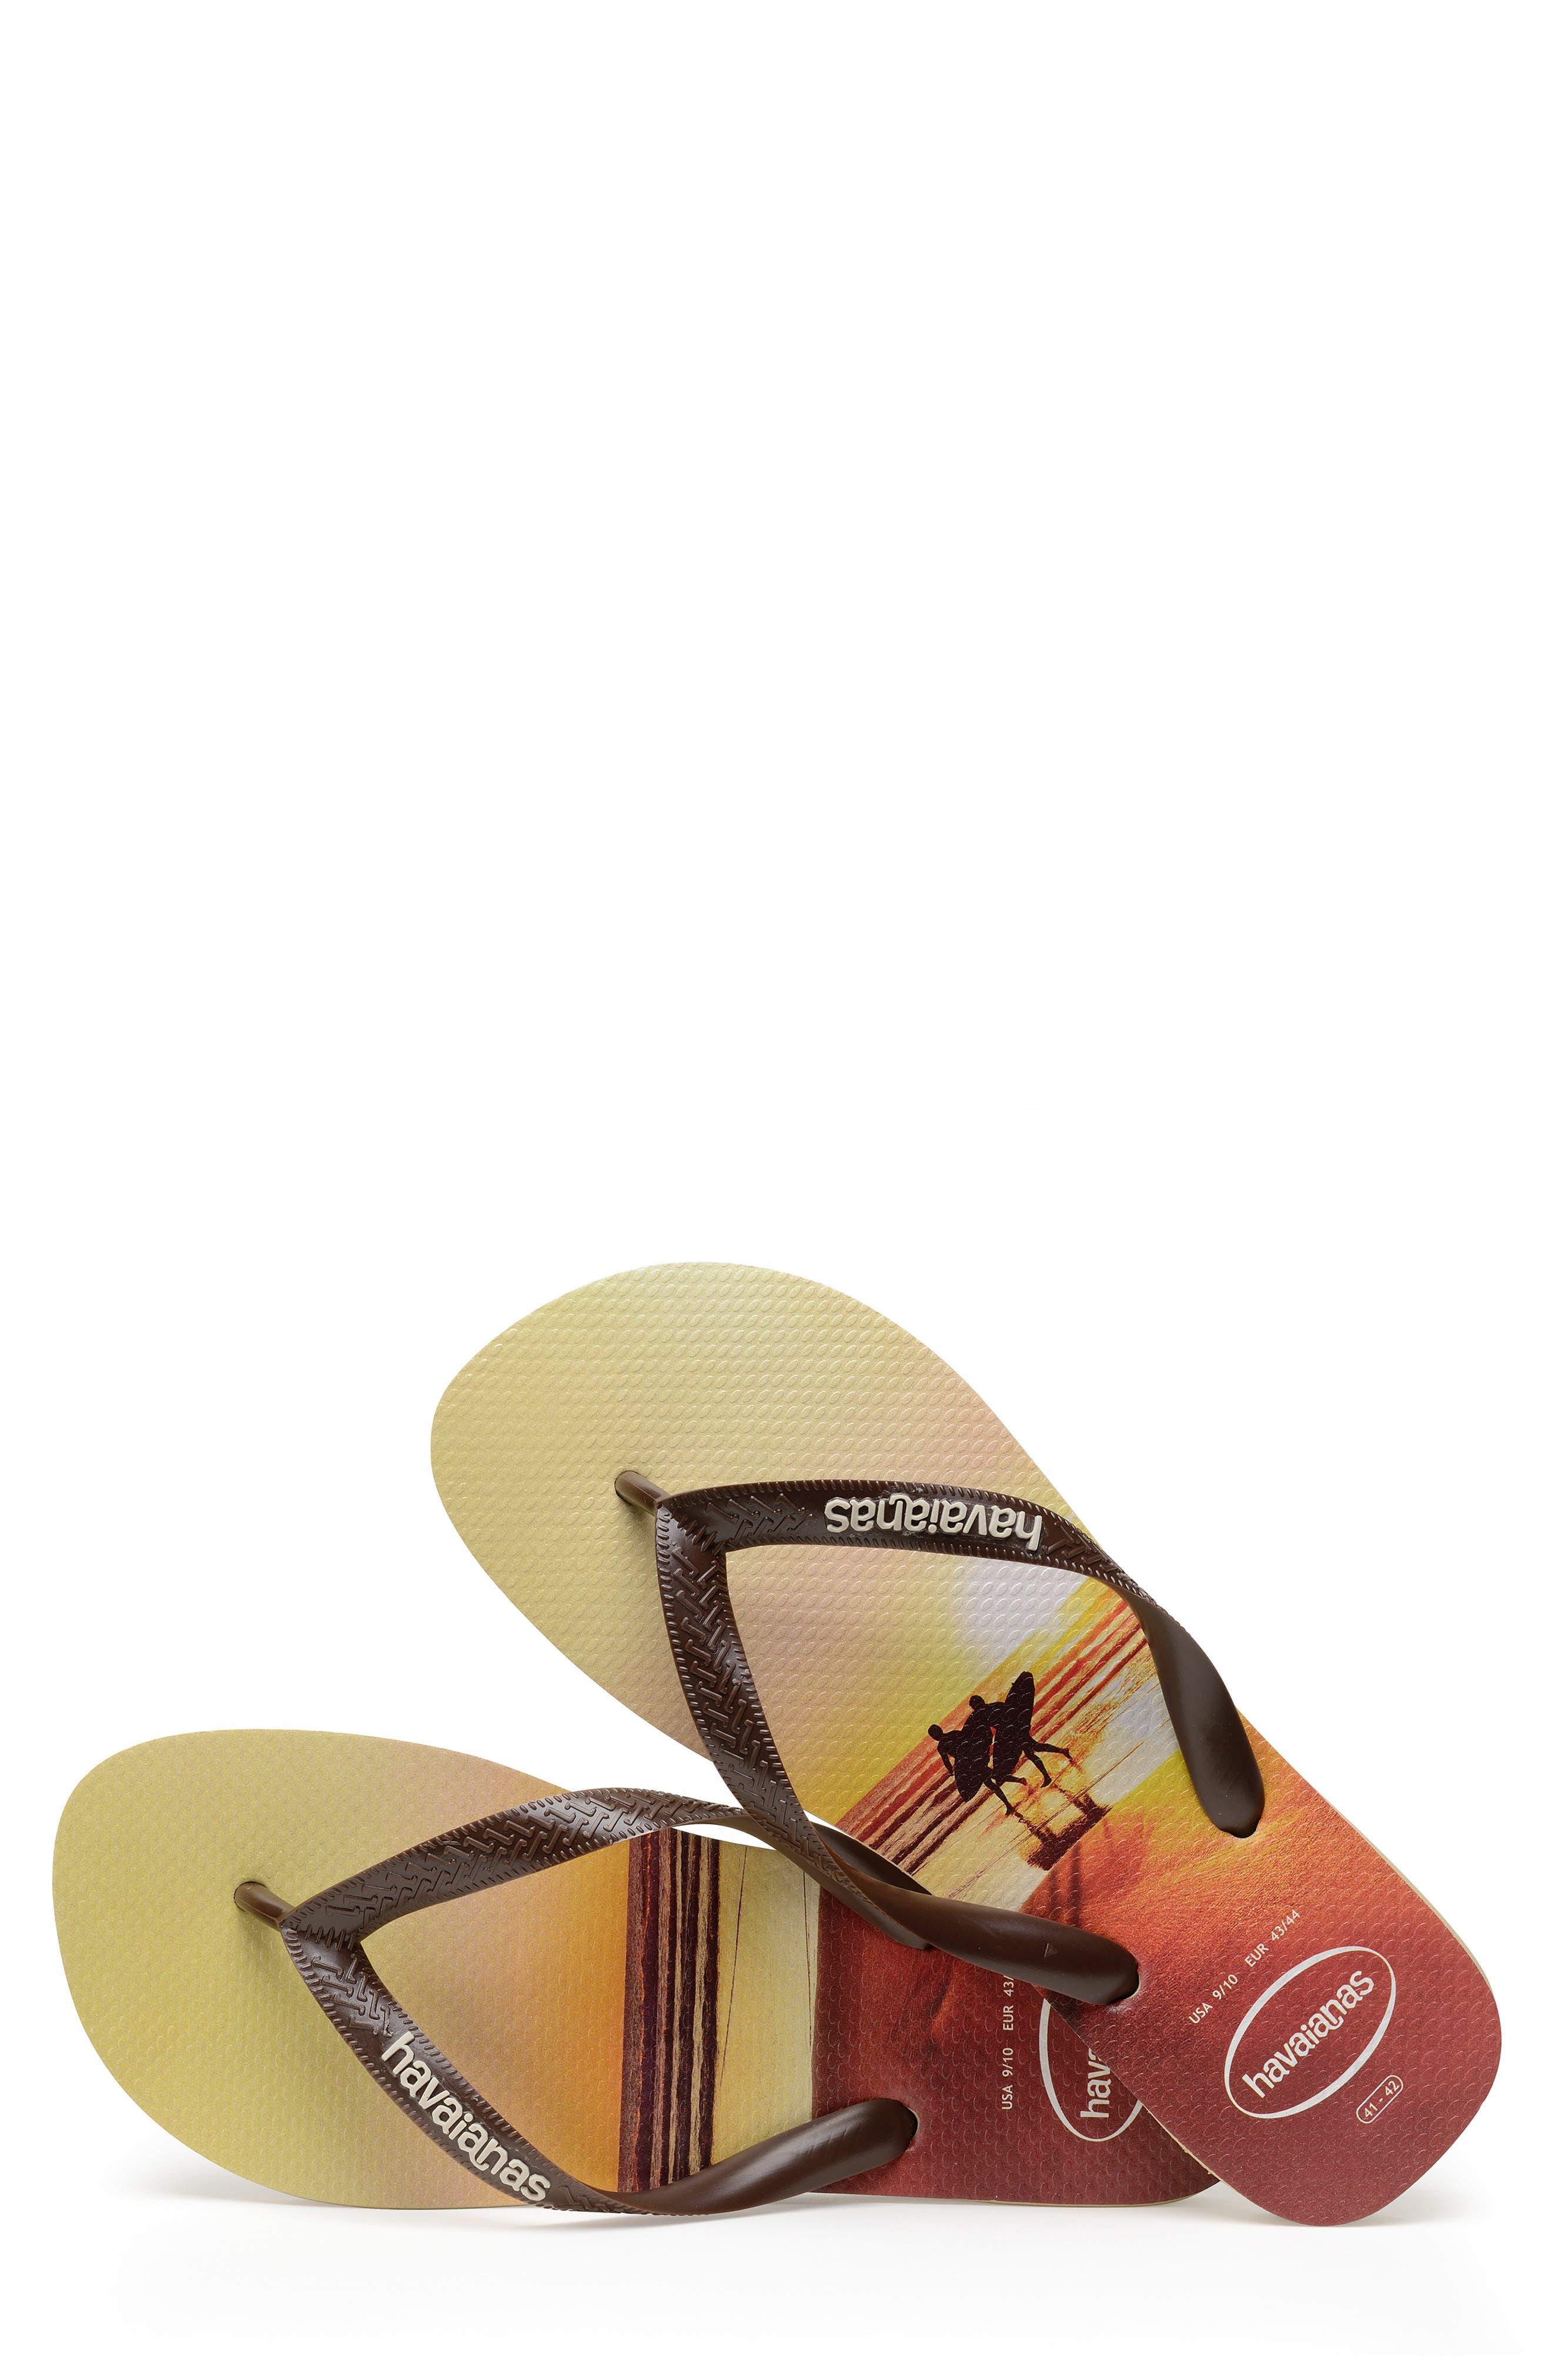 HAVAIANAS, 'Hype' Flip Flop, Alternate thumbnail 4, color, SAND GREY/ DARK BROWN